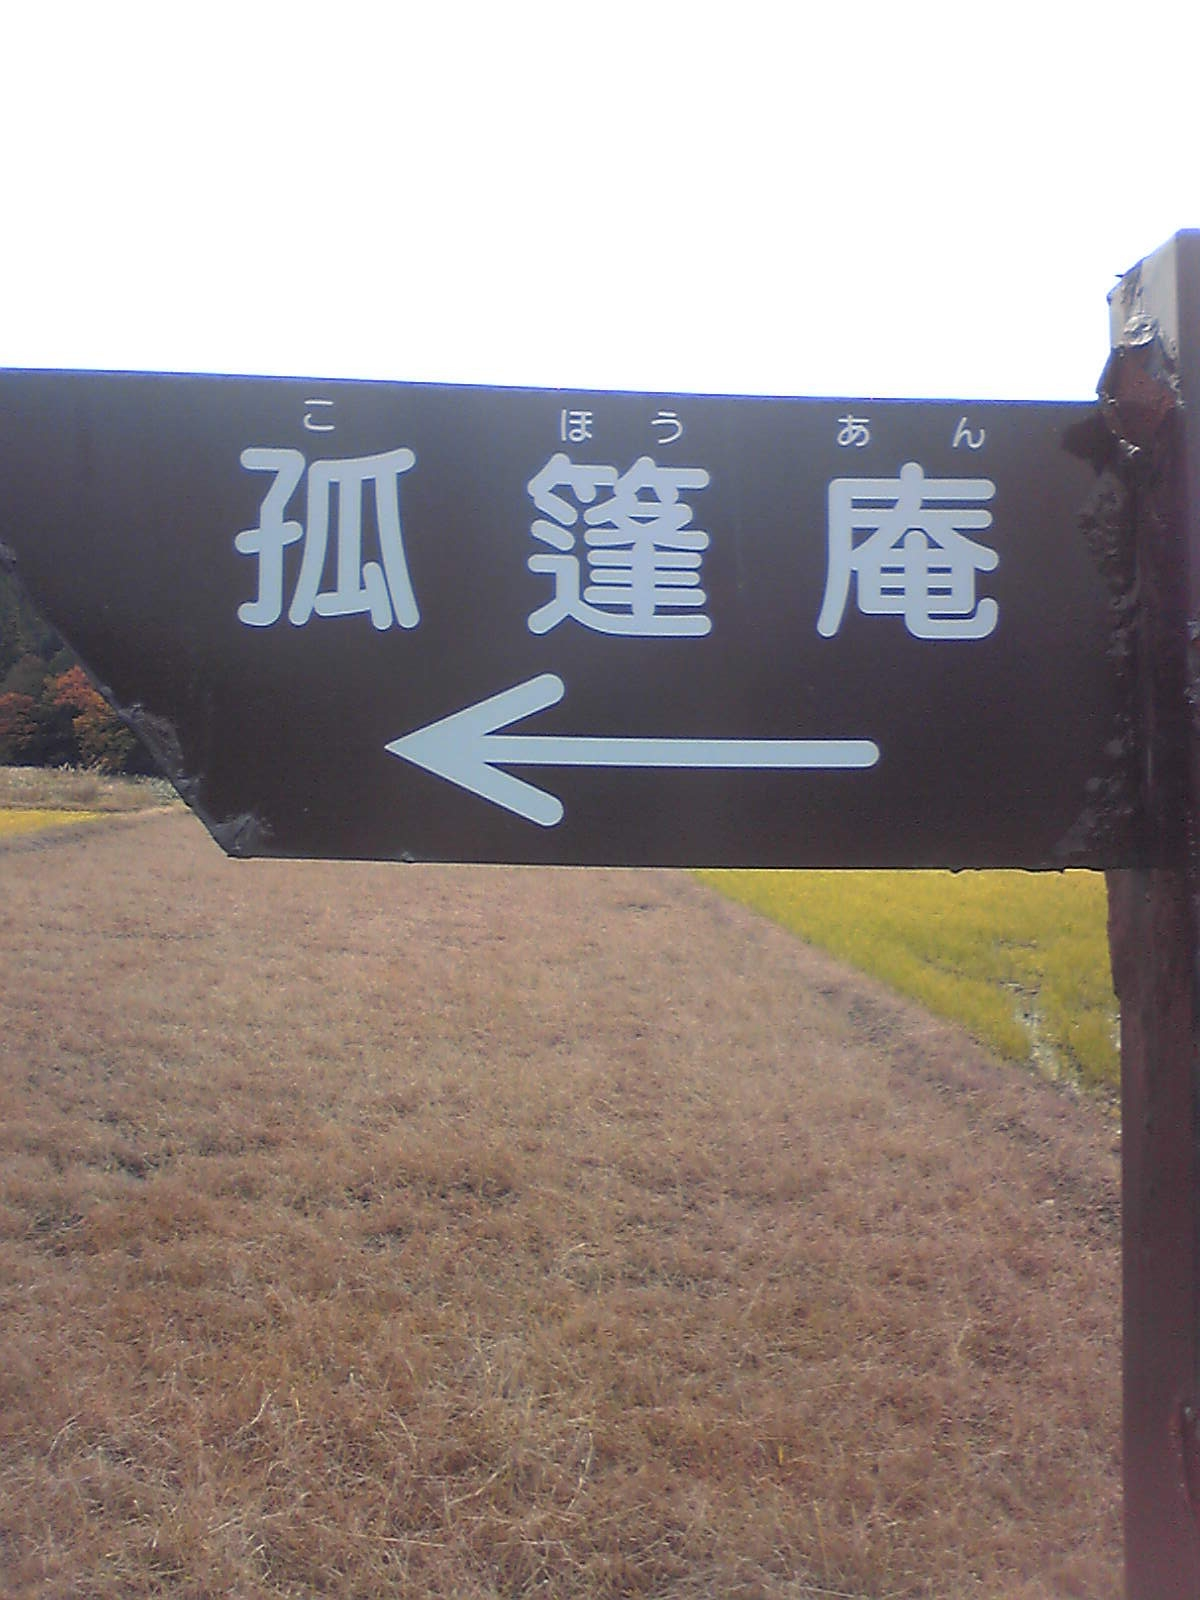 Image641.jpg